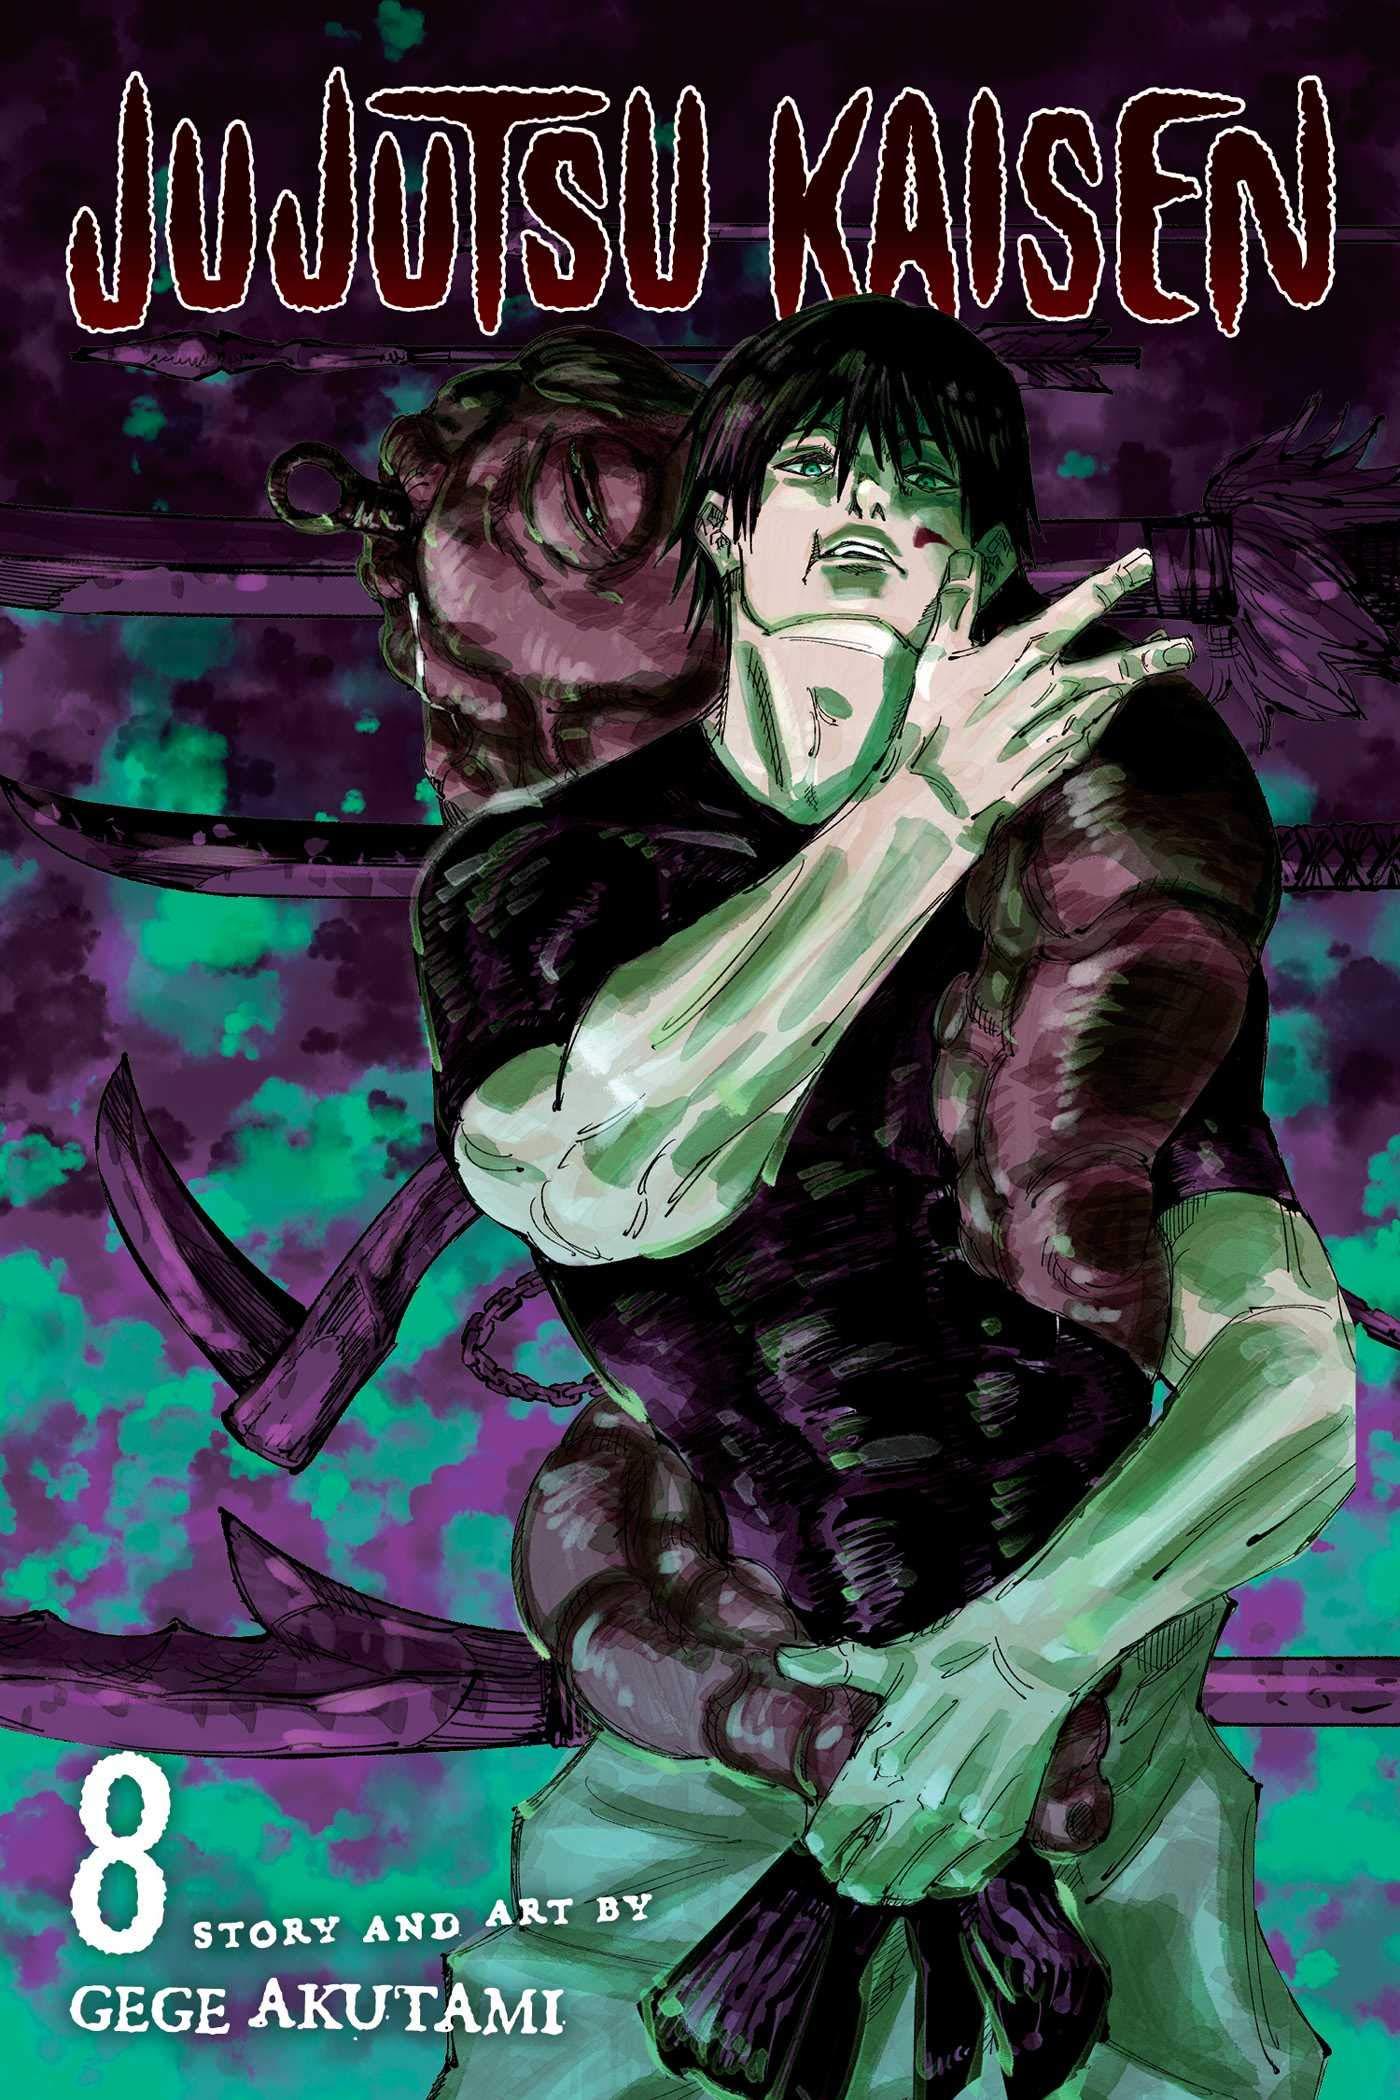 Jujutsu Kaisen Vol 8 Amazon De Akutami Gege Akutami Gege Fremdsprachige Bucher